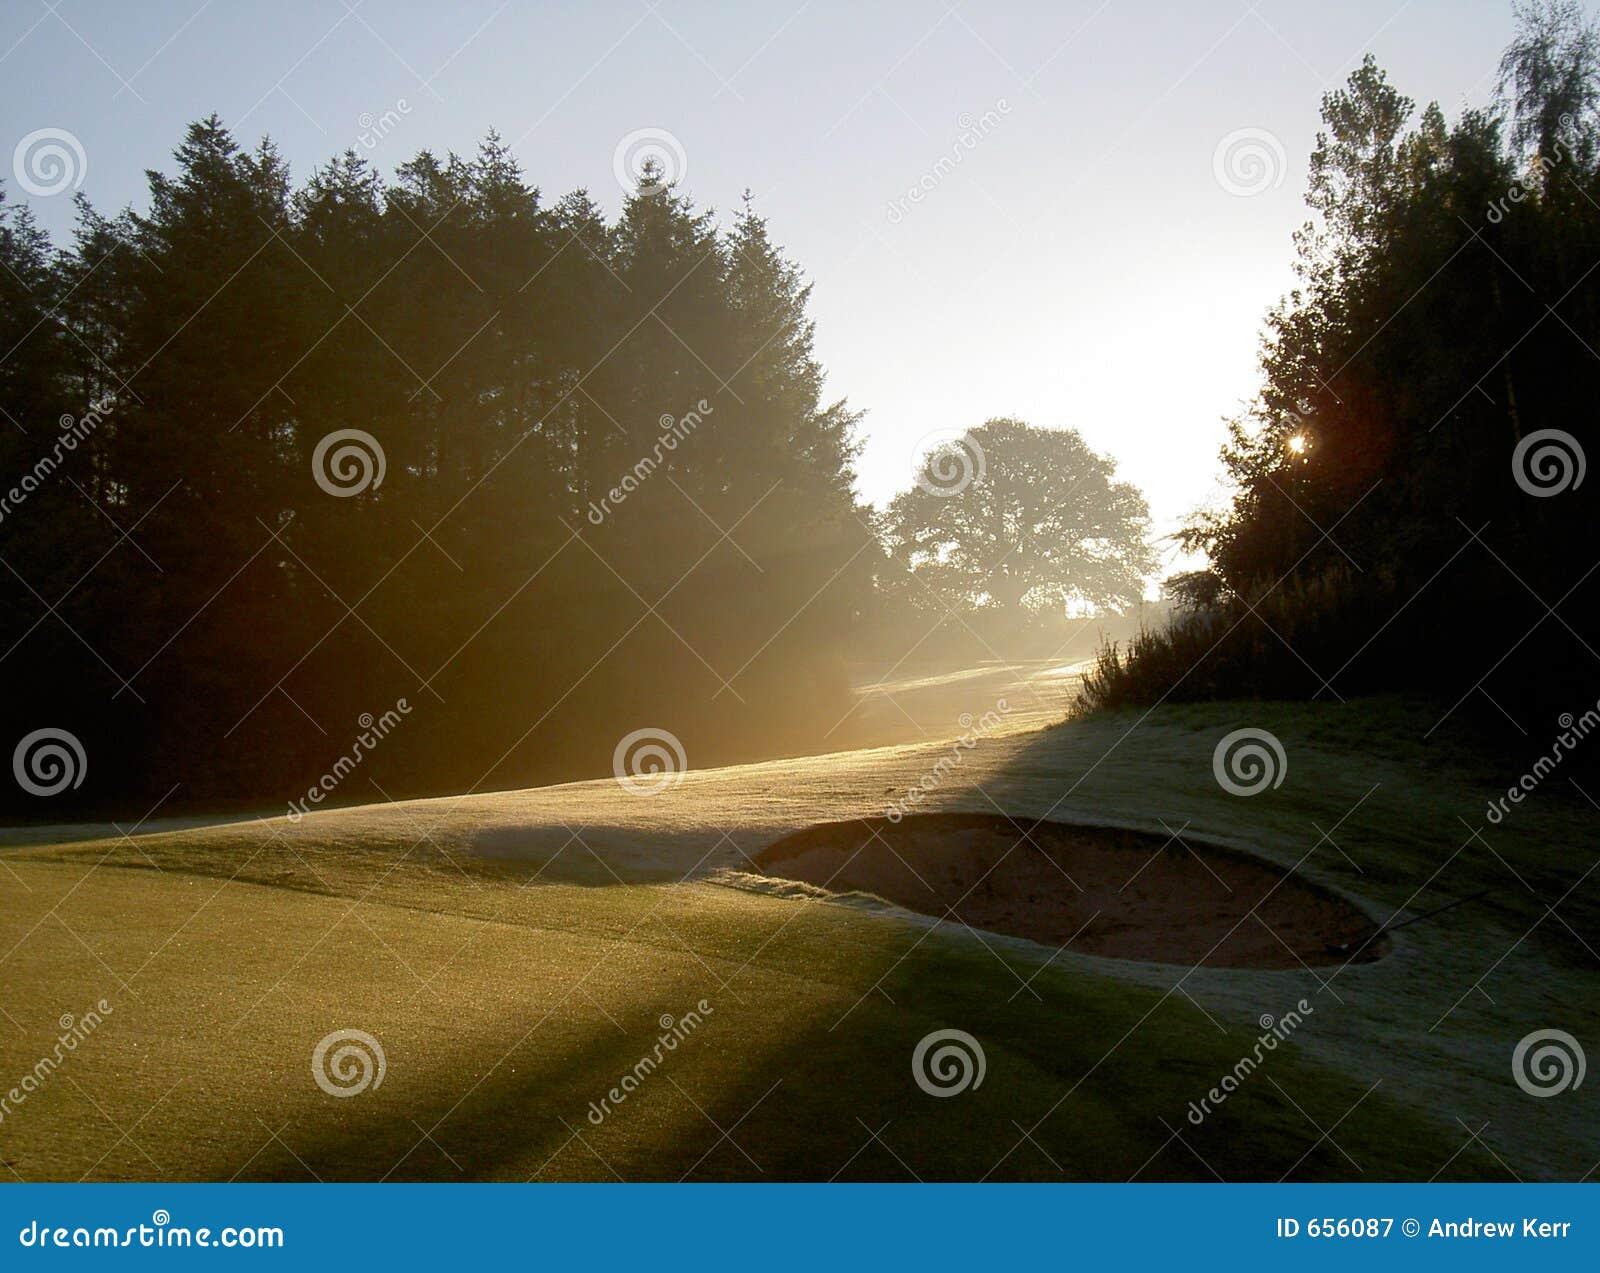 Early sunrise on a golf course